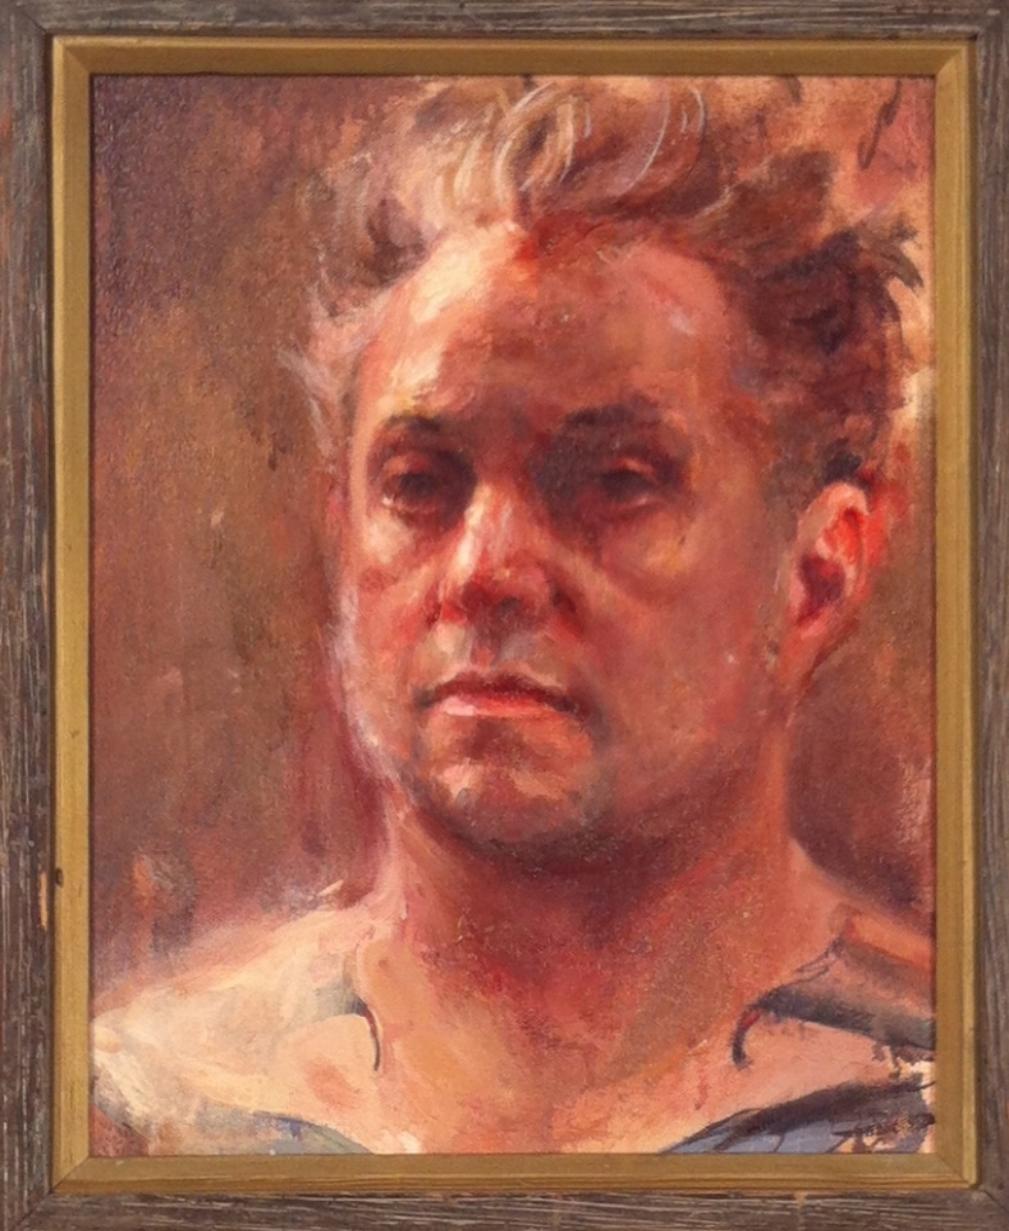 "Shawn Barber "" Self Portrait Study at 43"" Oil on canvas 21.5x17.5 $2500"